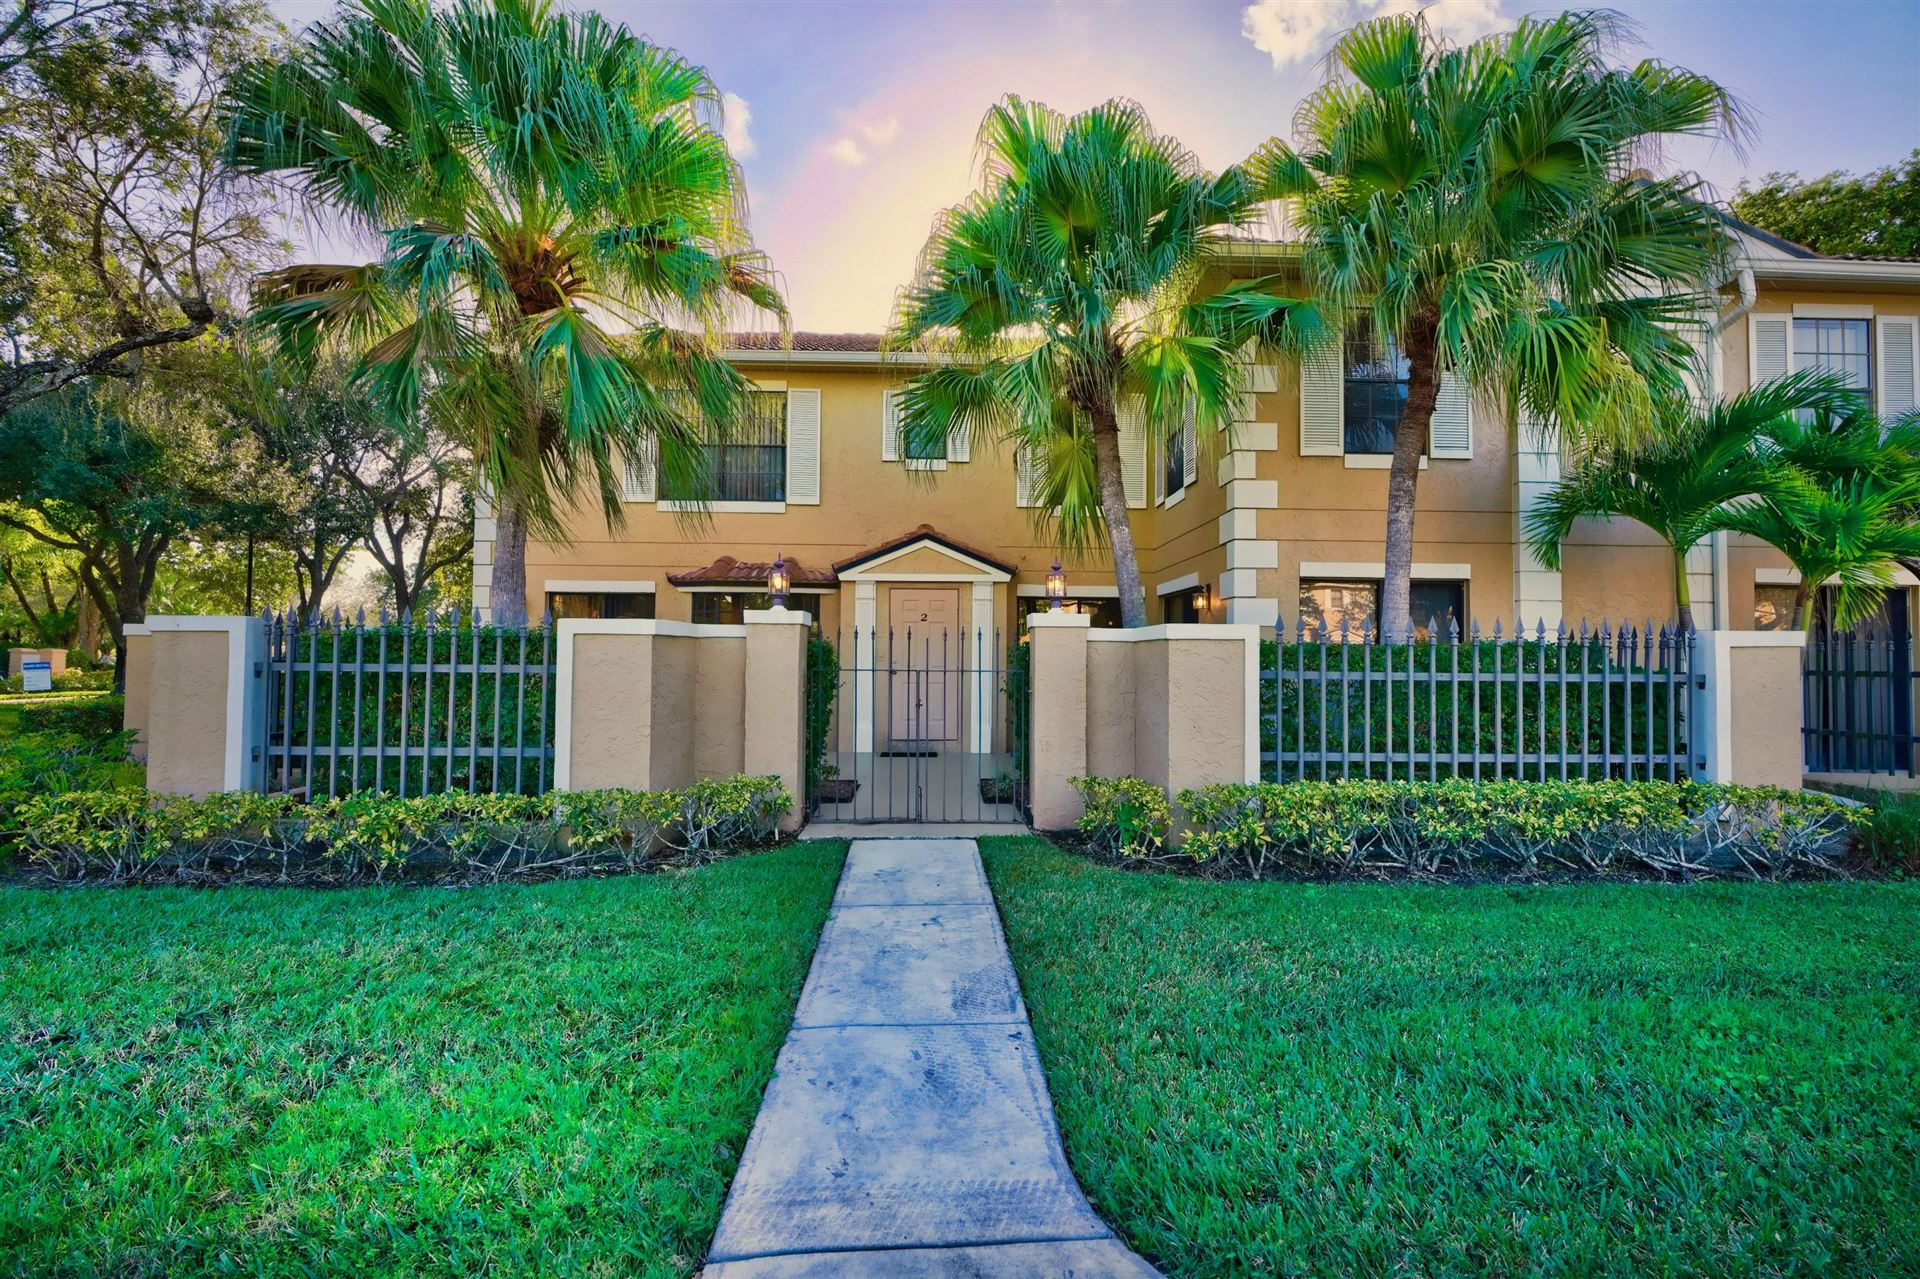 Photo of 365 Prestwick Circle #2, Palm Beach Gardens, FL 33418 (MLS # RX-10592014)